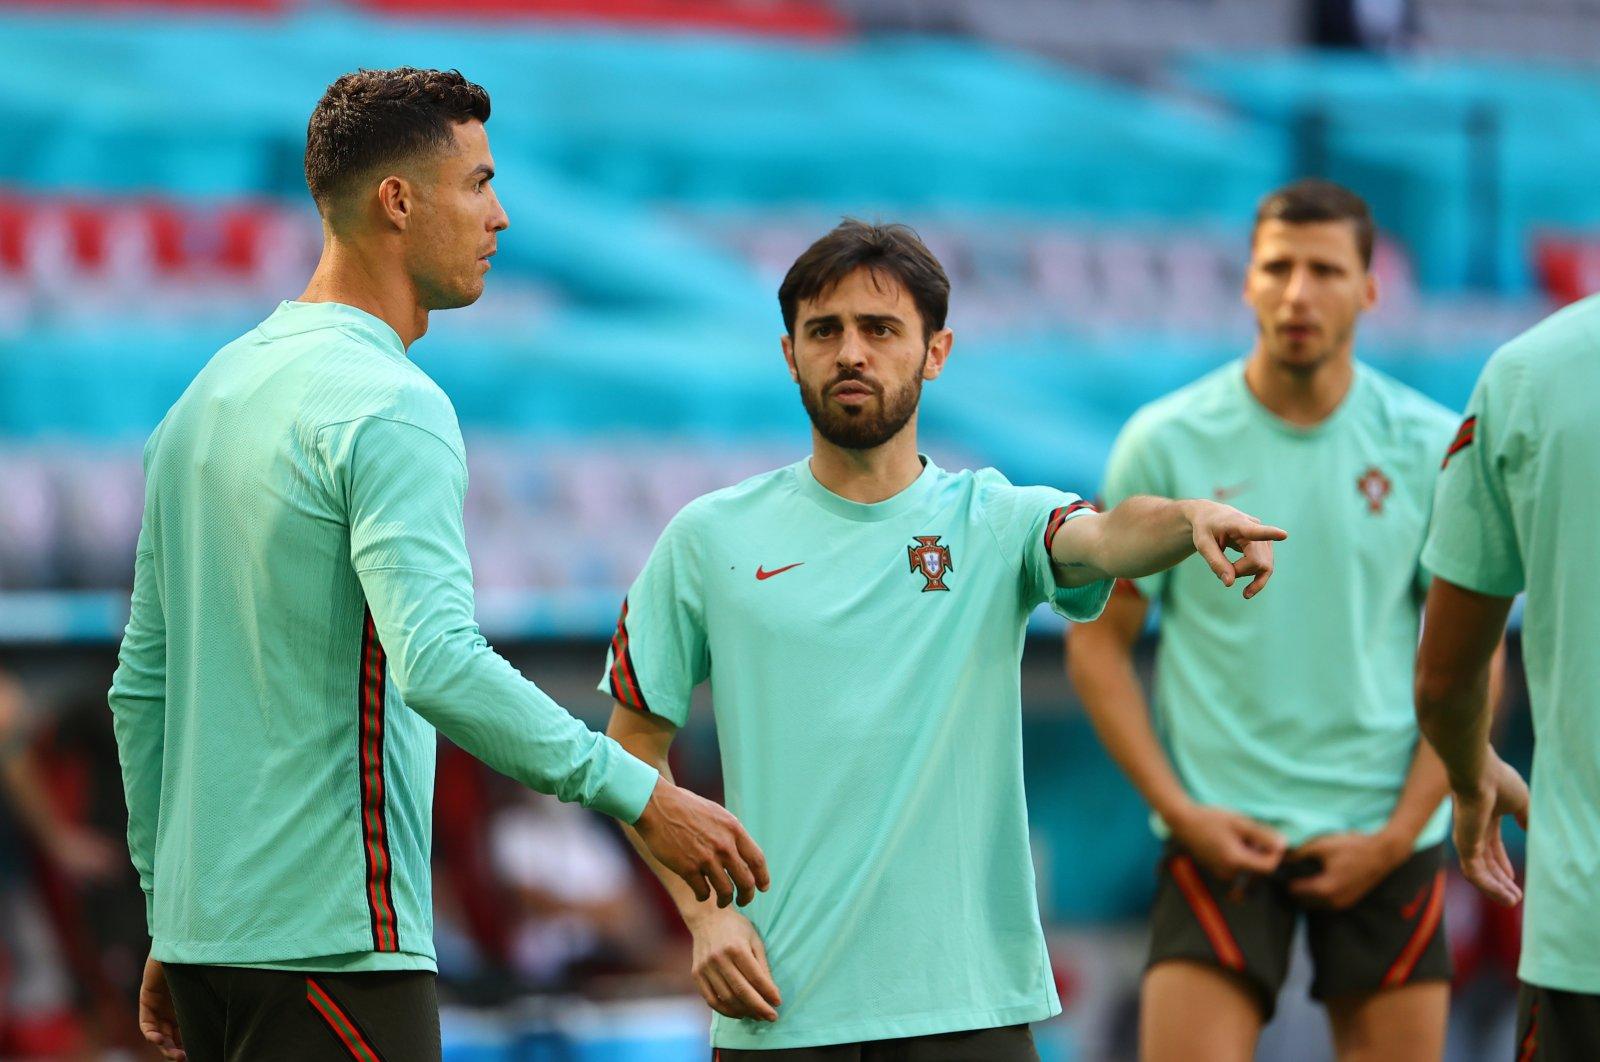 Portugal's Bernardo Silva (C) and Cristiano Ronaldo (L) attend a training session in Munich, Germany, June 18, 2021. (Reuters Photo)